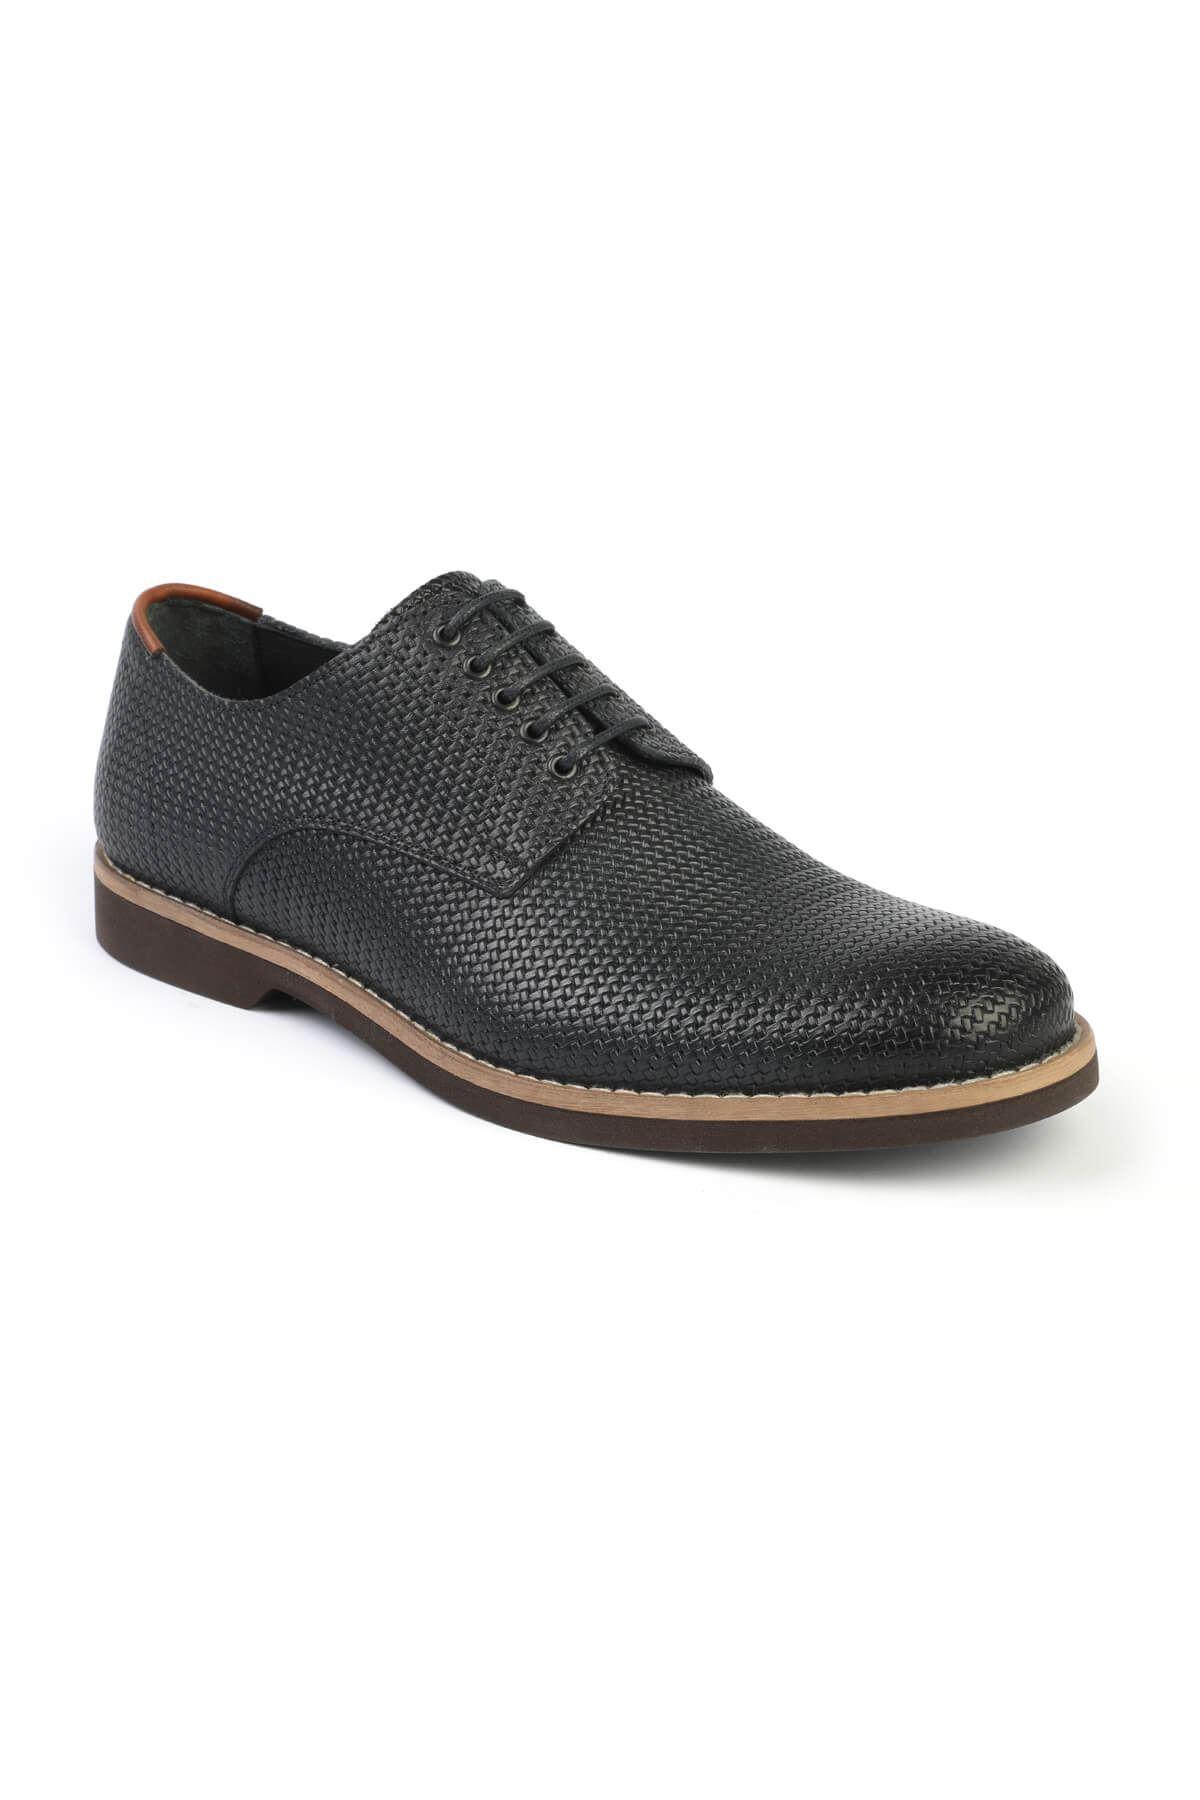 Libero C640 Navy Blue Casual Shoes